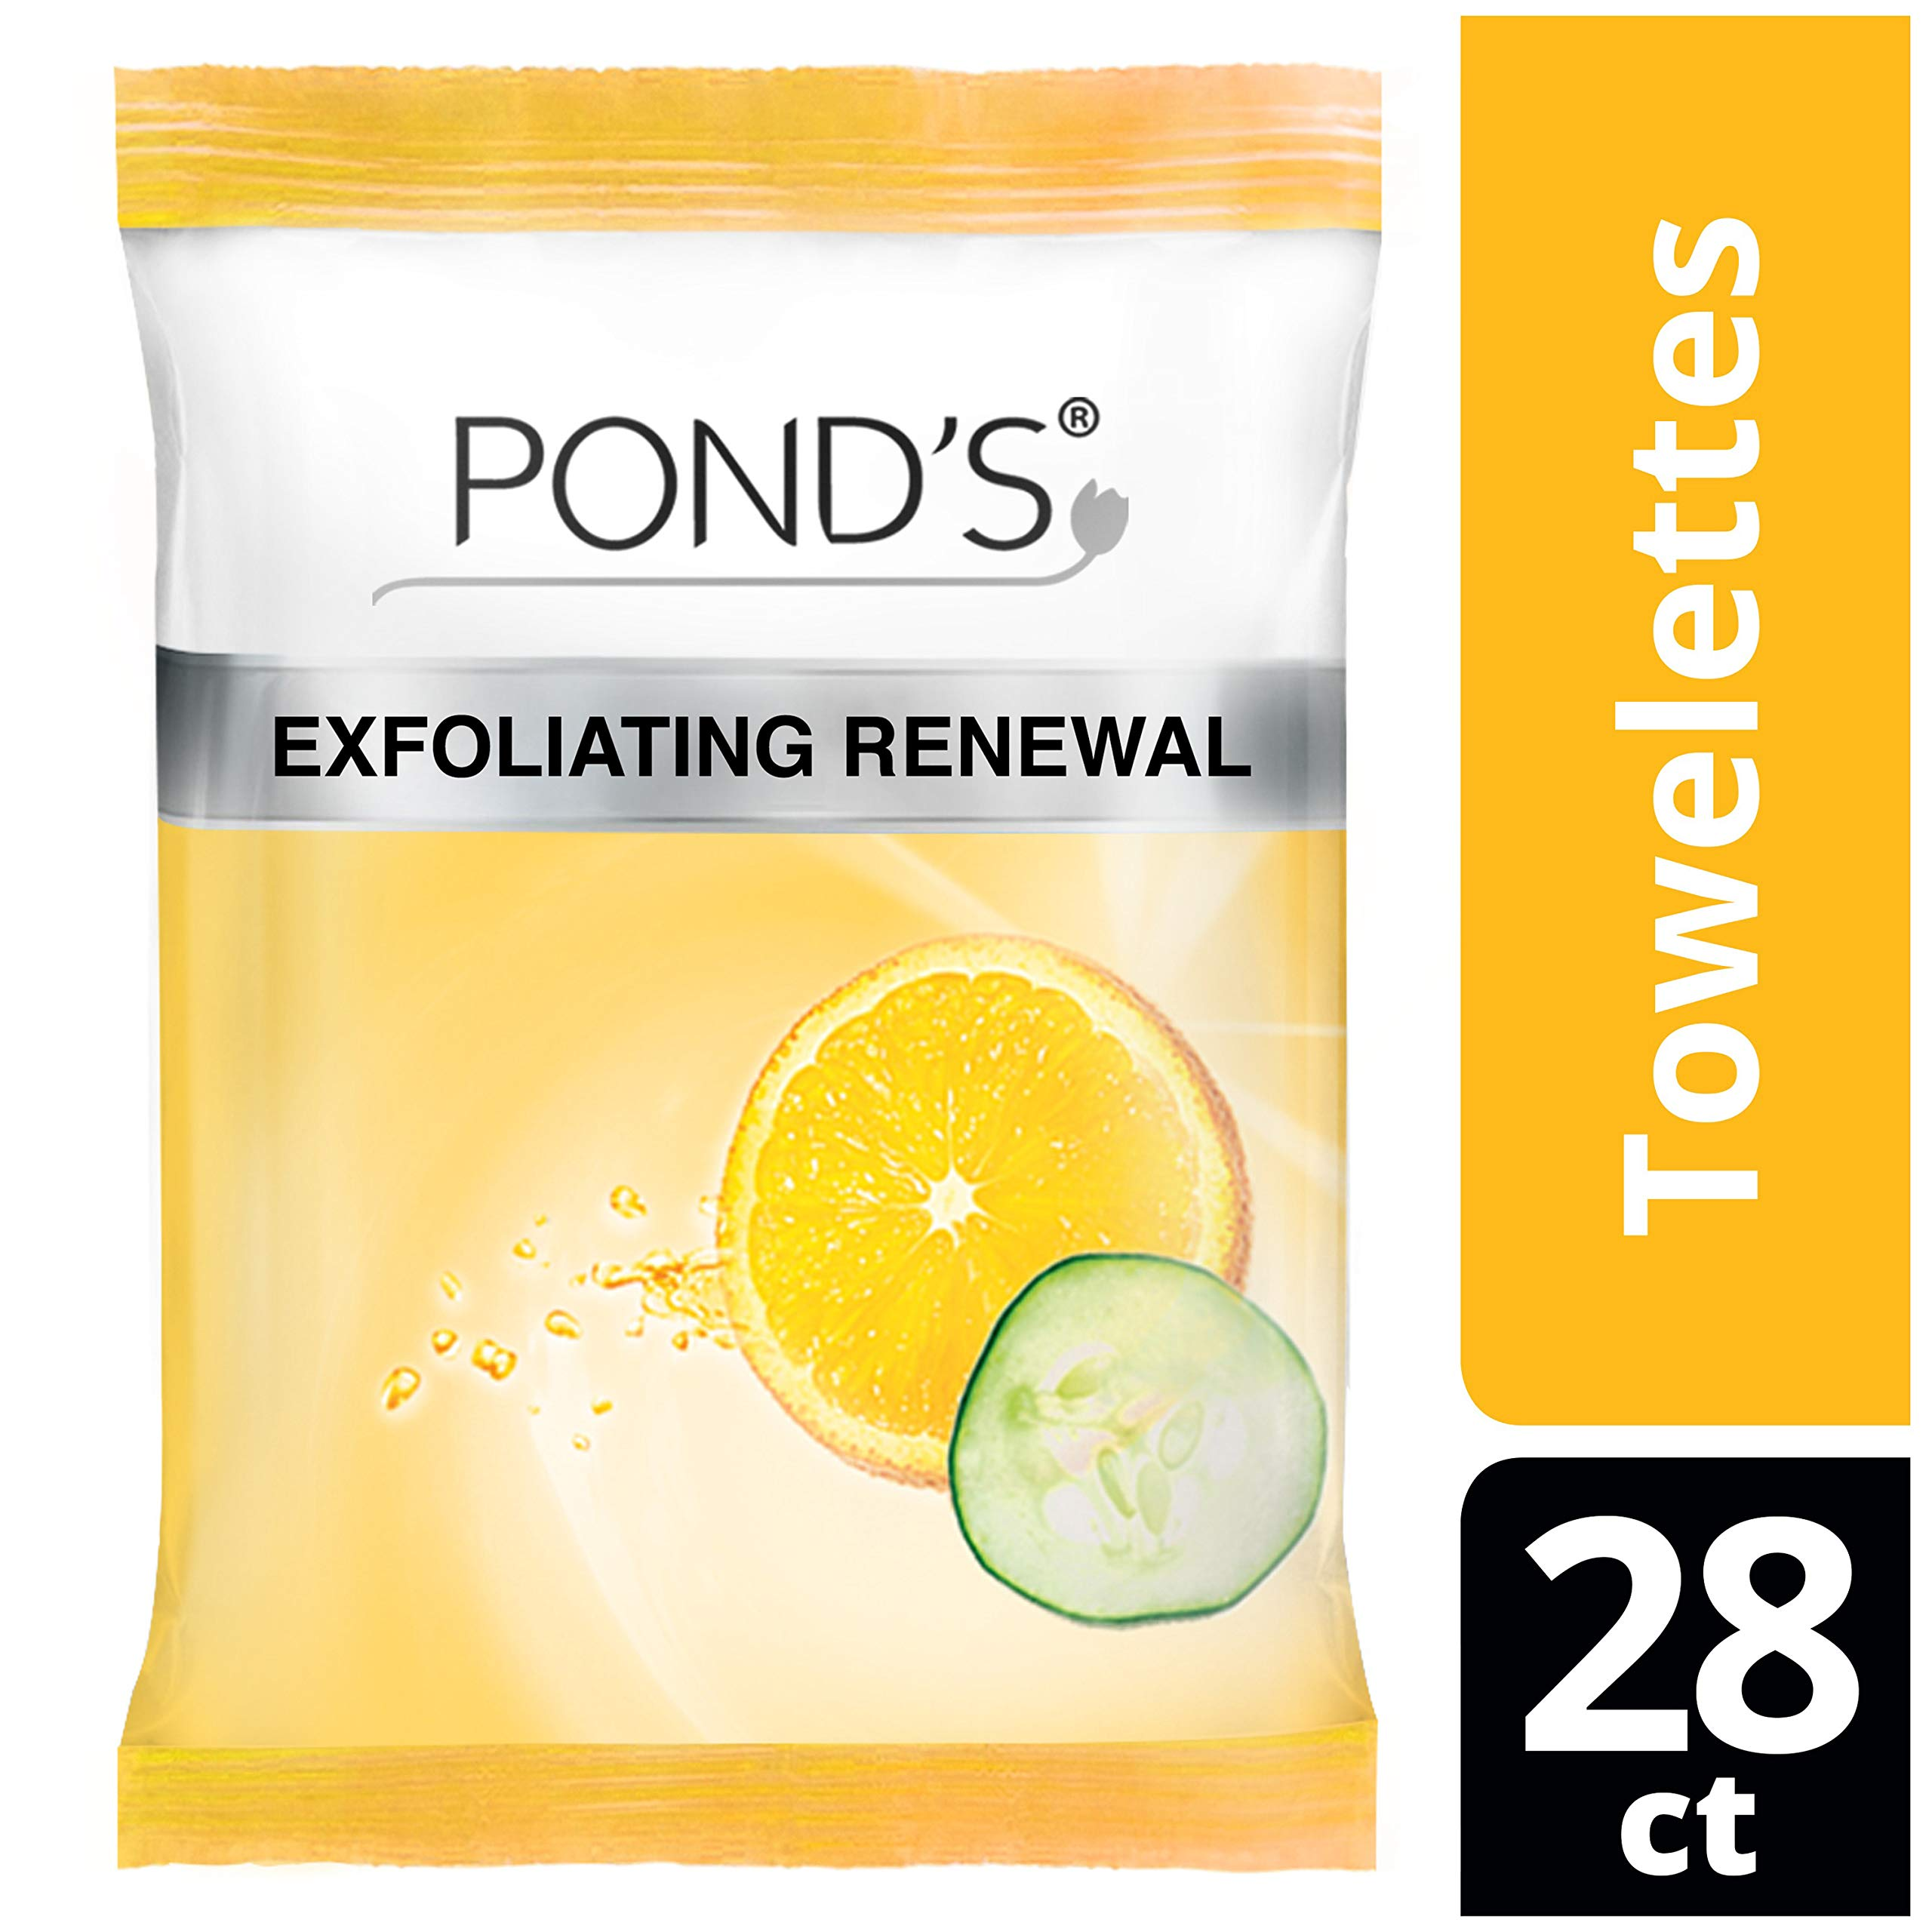 Ponds Moisture Clean Towelettes, Exfoliating Renewal, ...